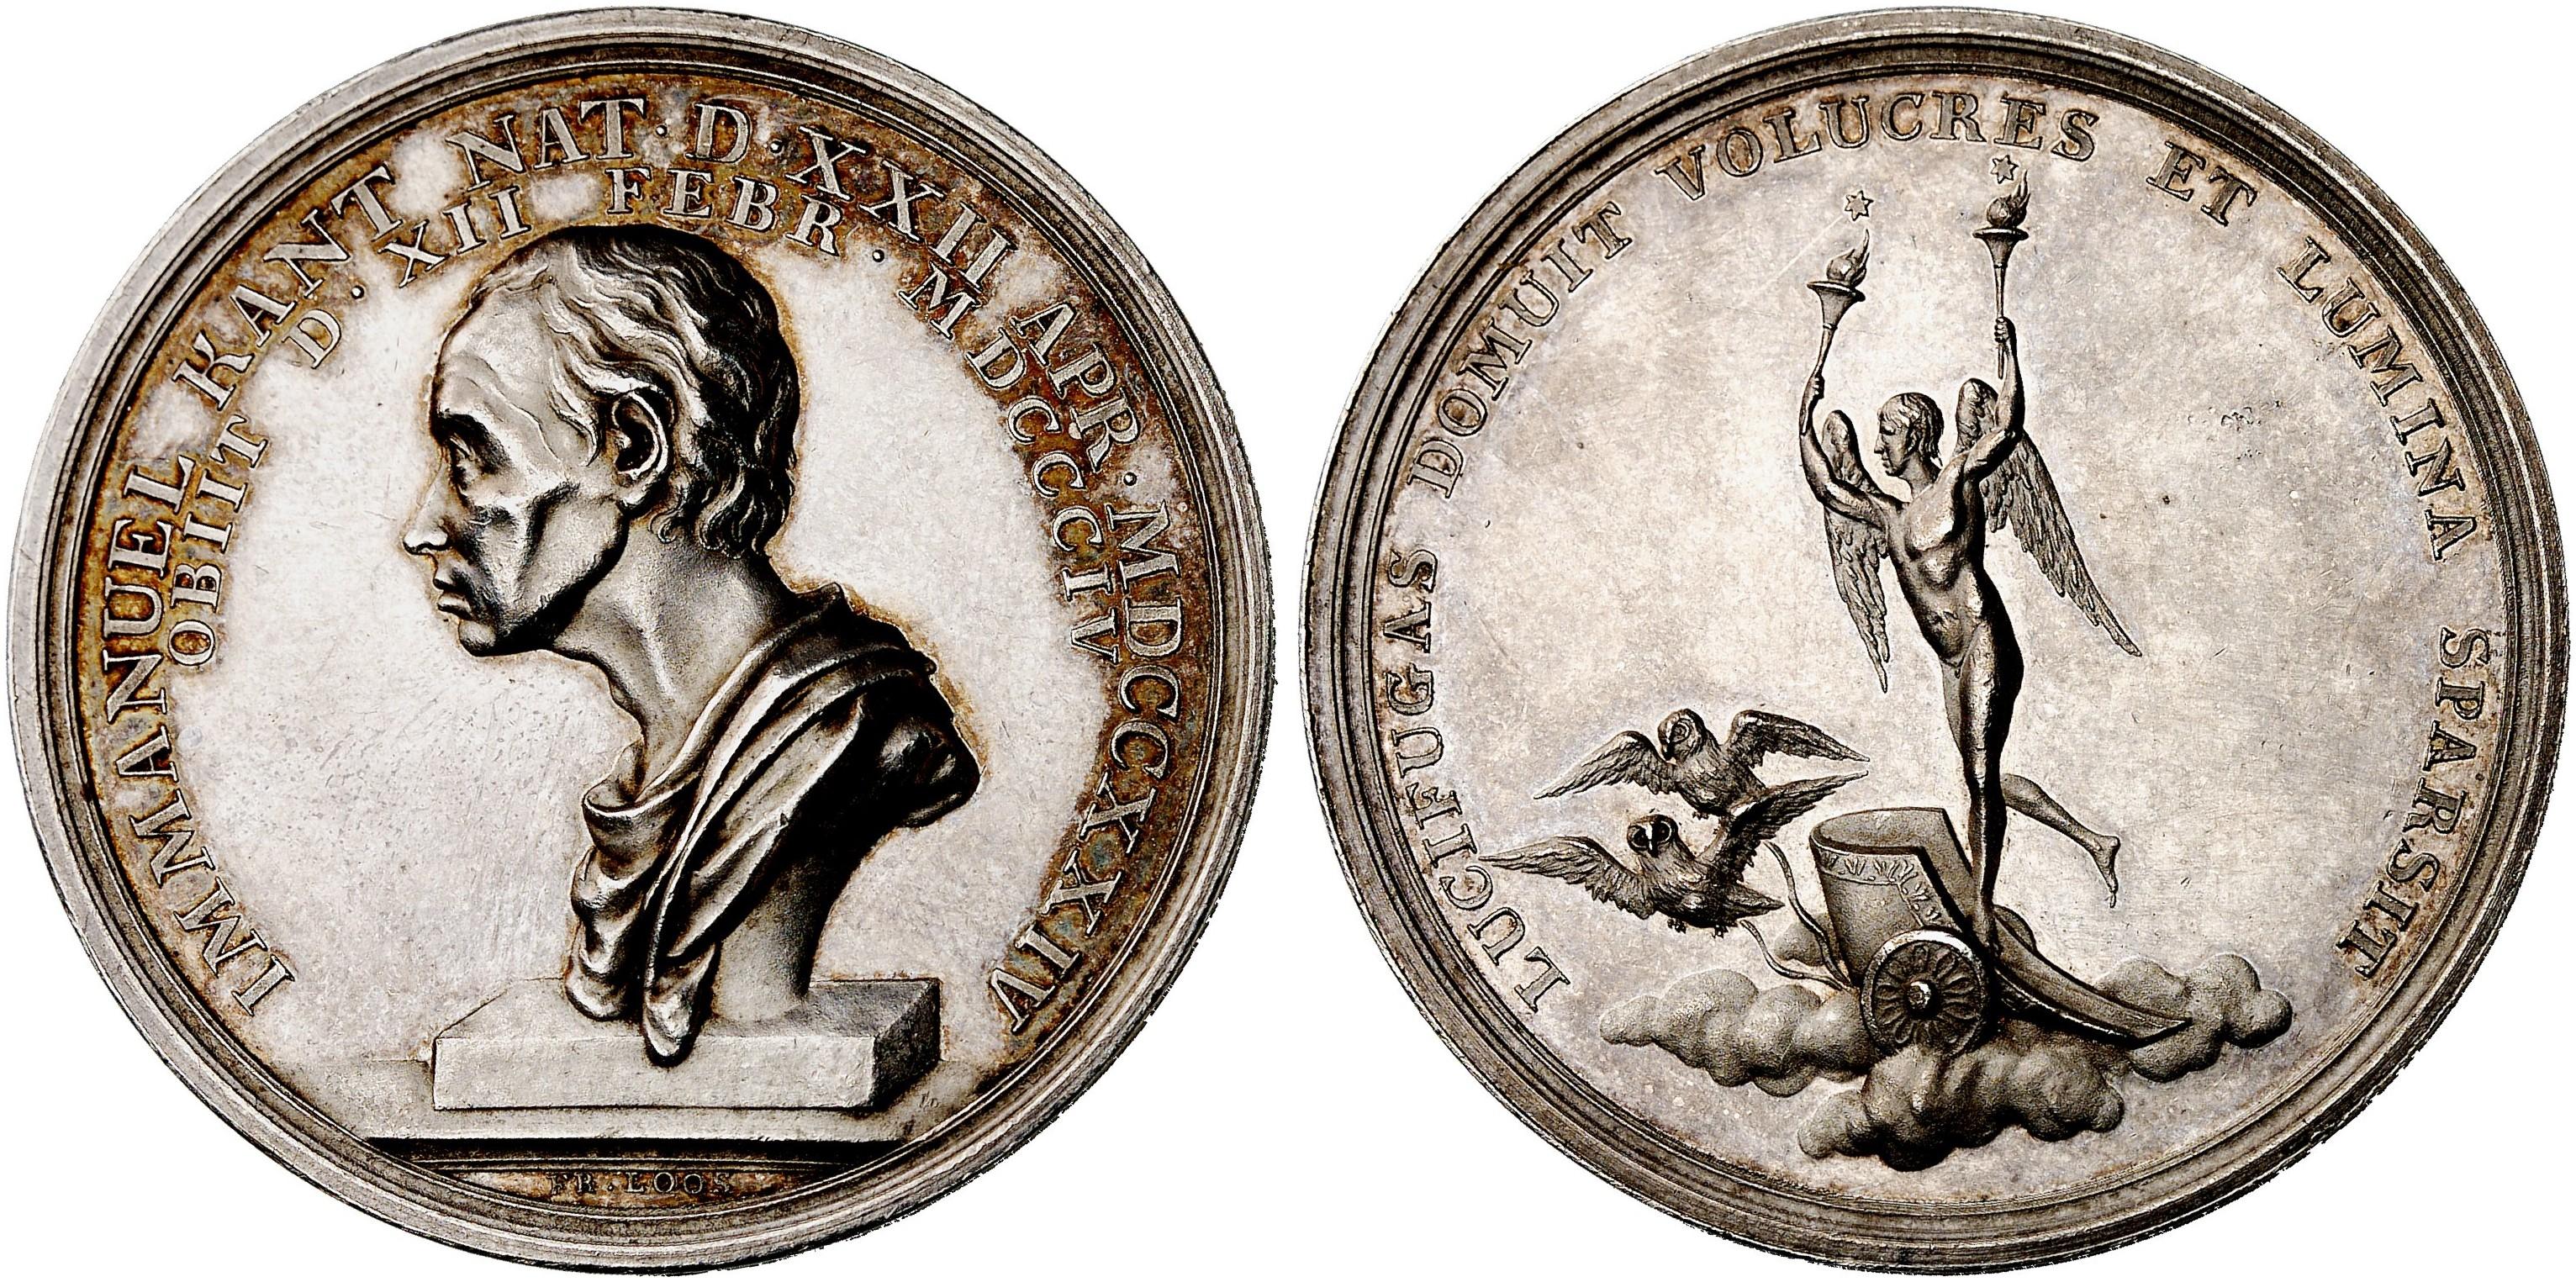 Friedrich Wilhelm Iii 1797 1840 Silbermedaille 1804 Laverrenz